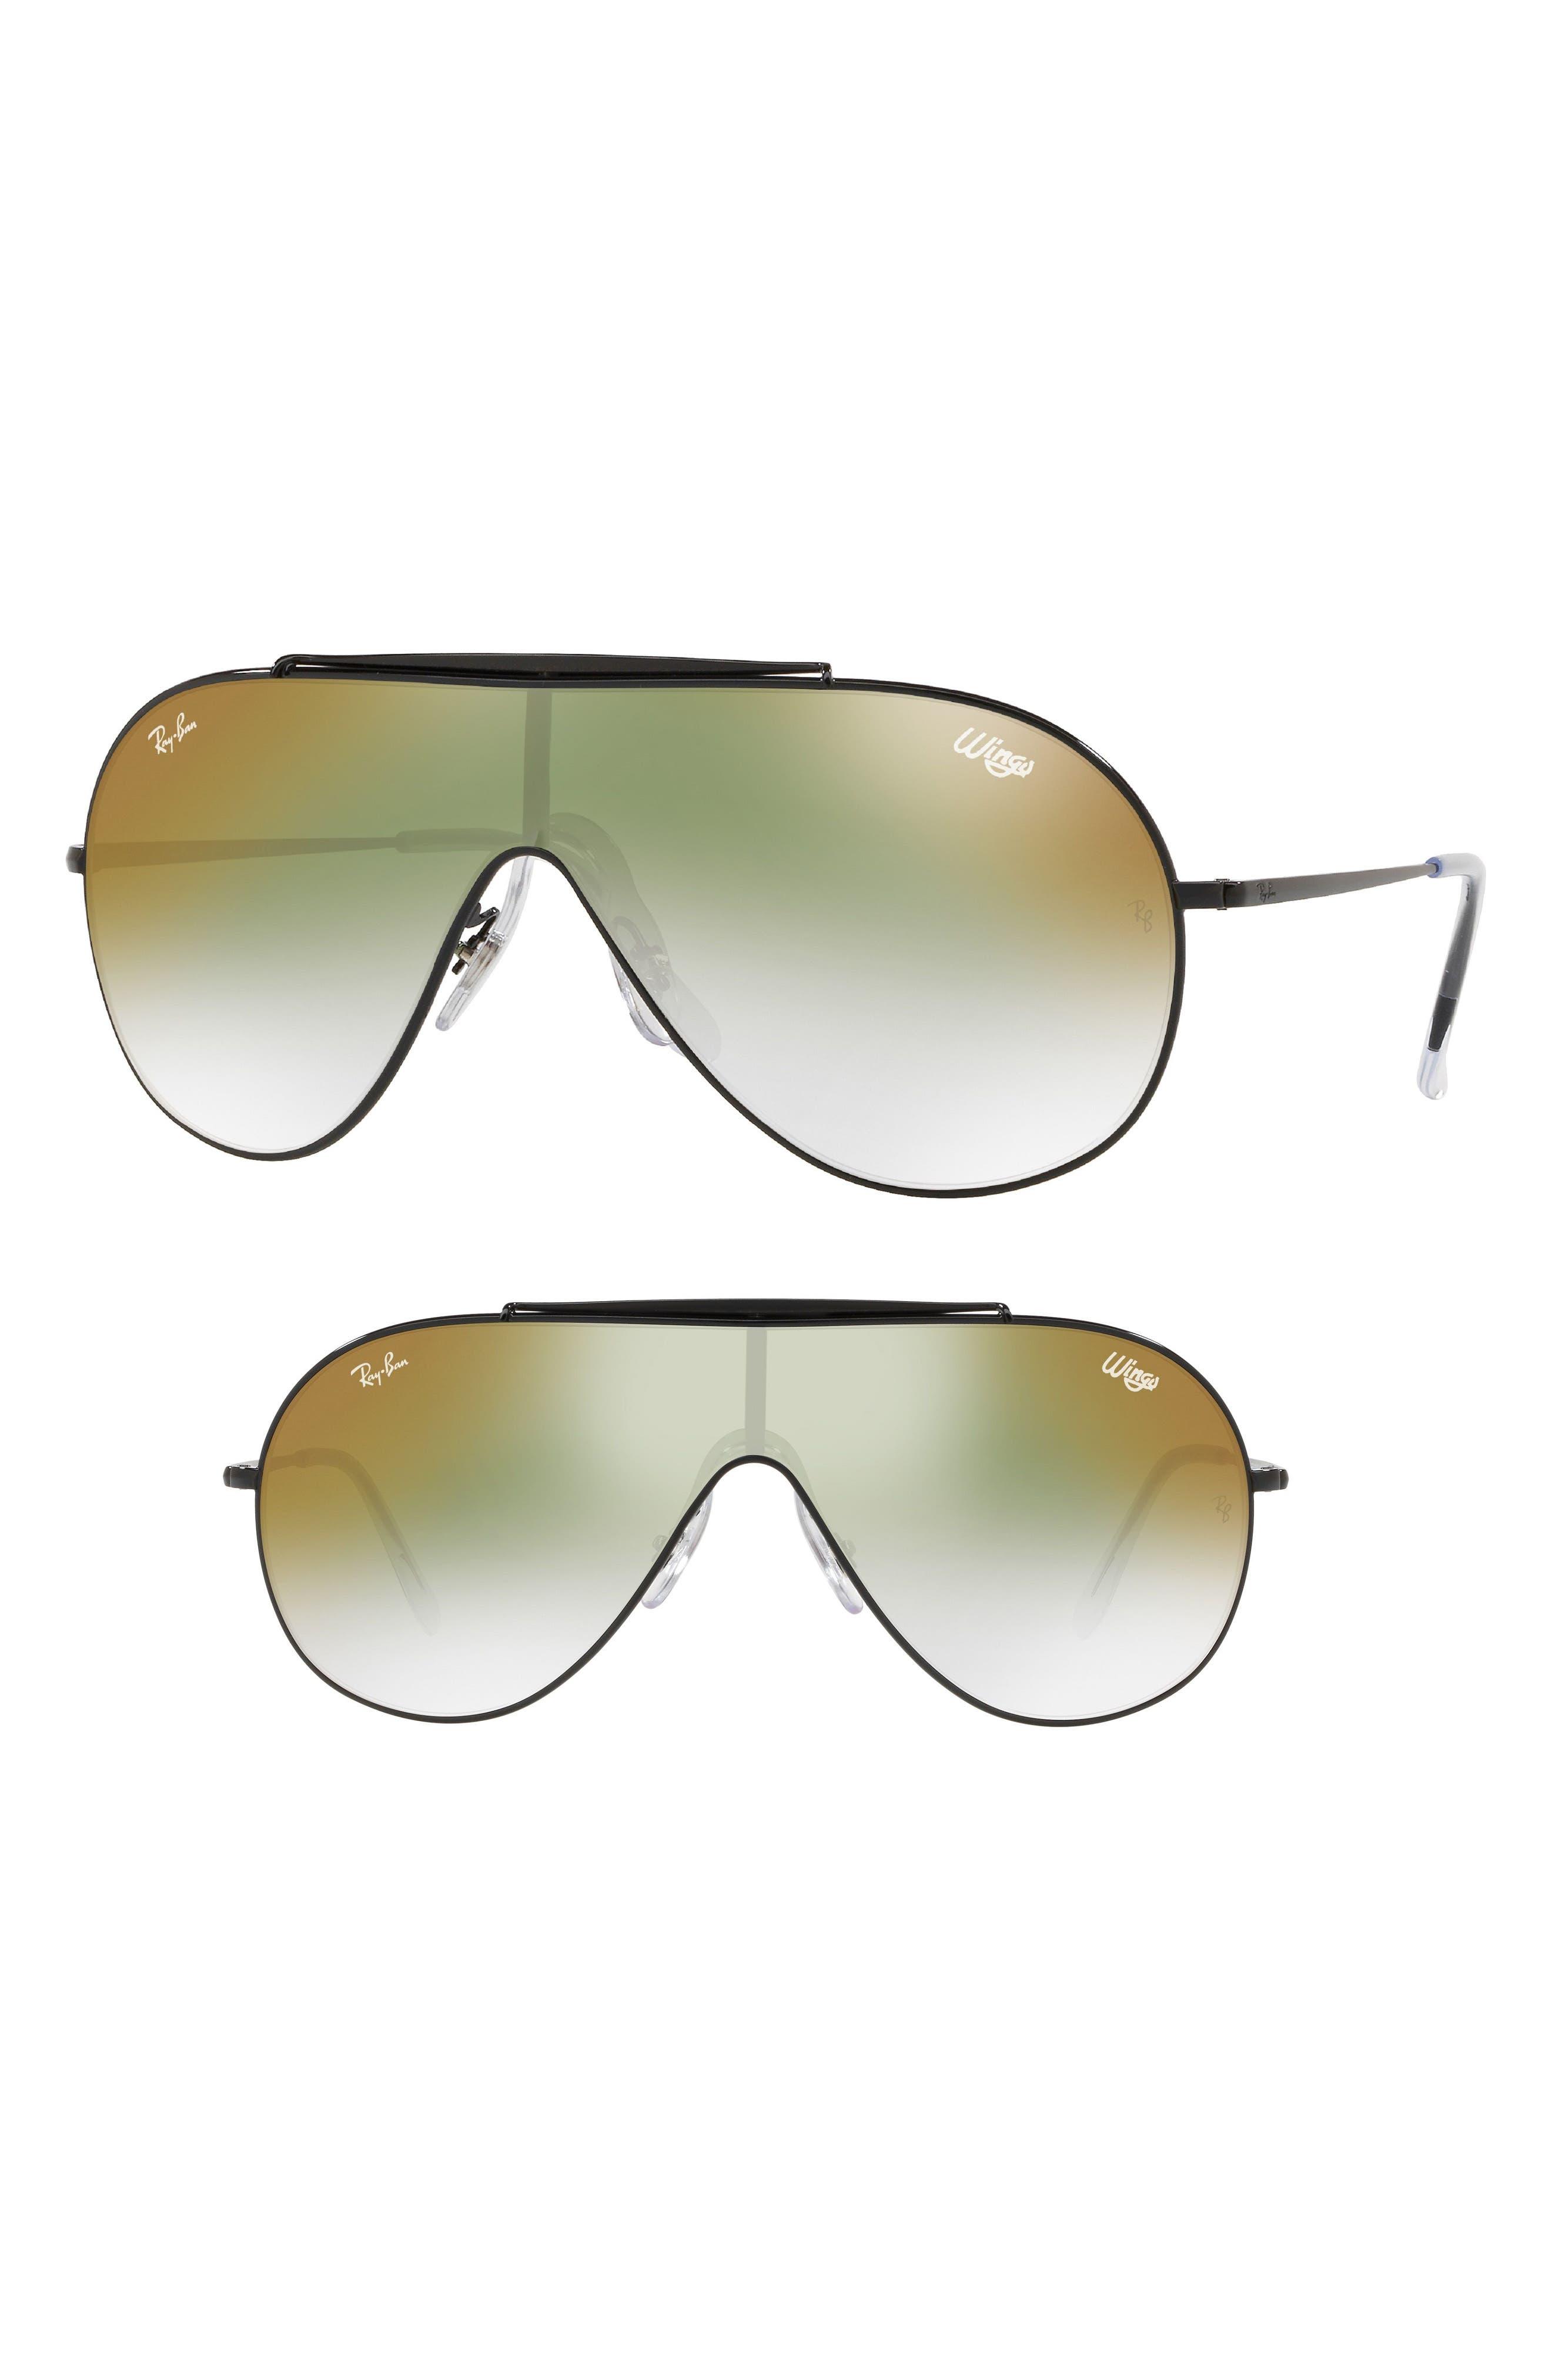 133mm Shield Sunglasses,                         Main,                         color, 001